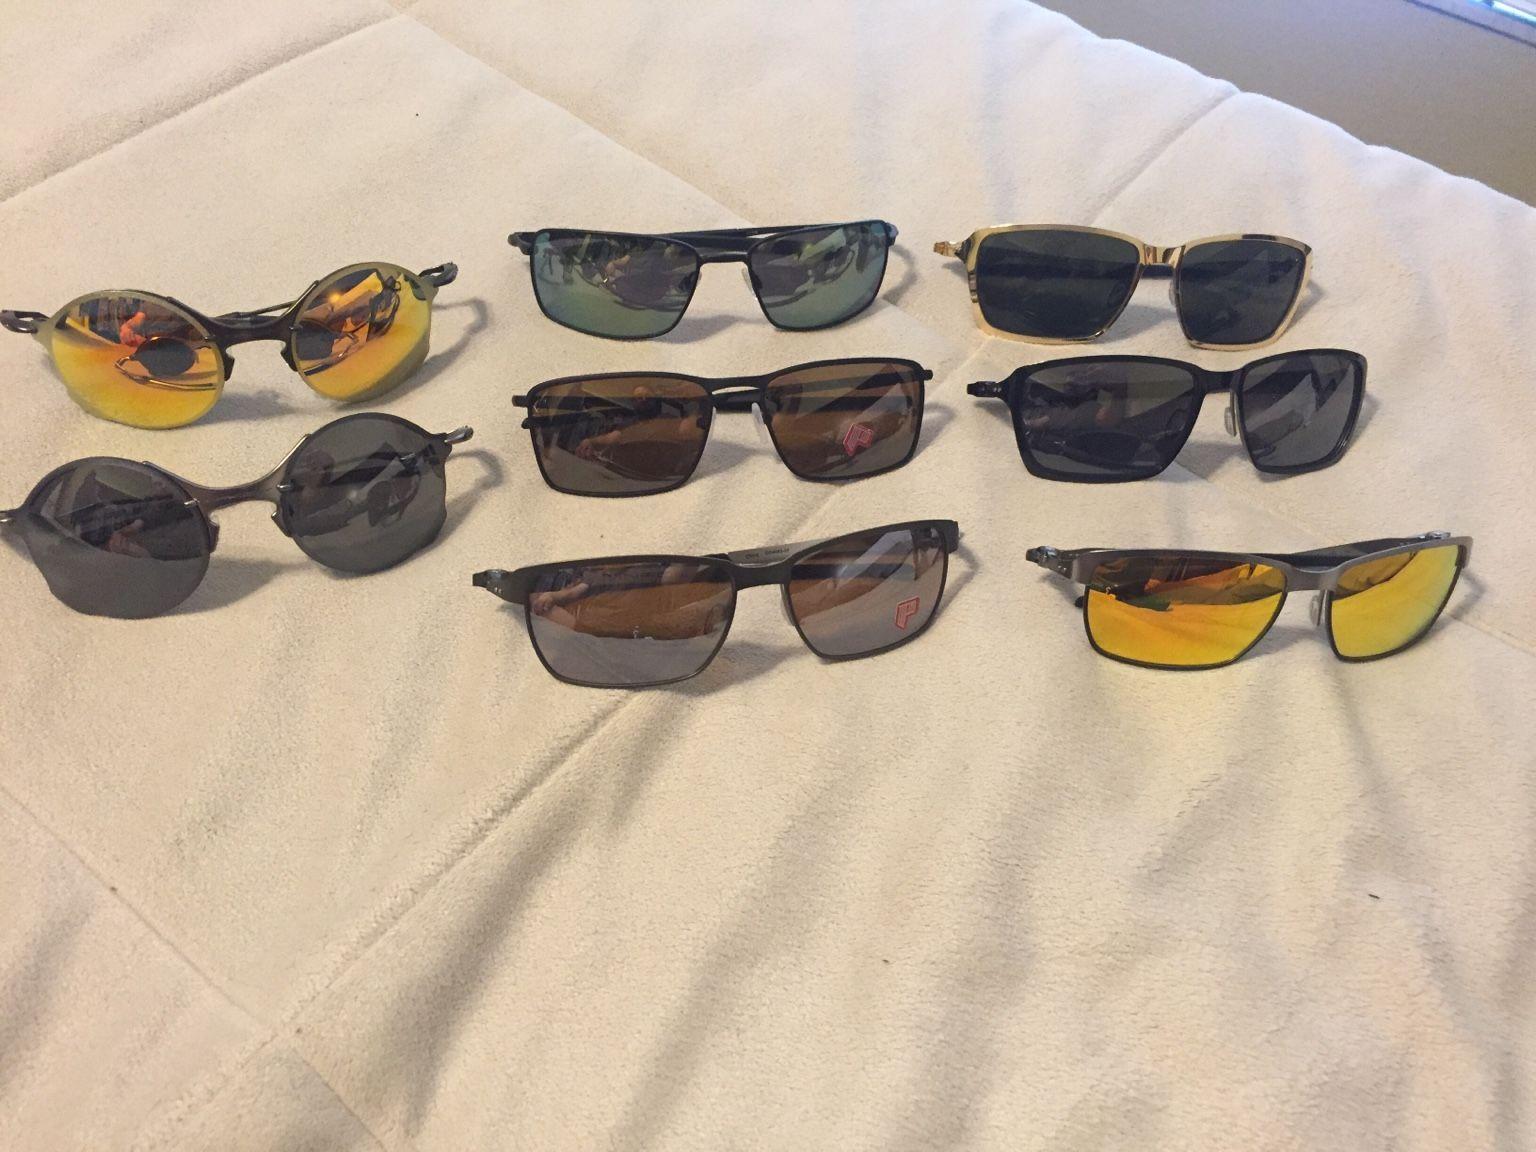 Many frames!!! EVEN LOWER!!!! Price drop!!!! - e58222f4d6cb0630debb8000548736f8.jpg